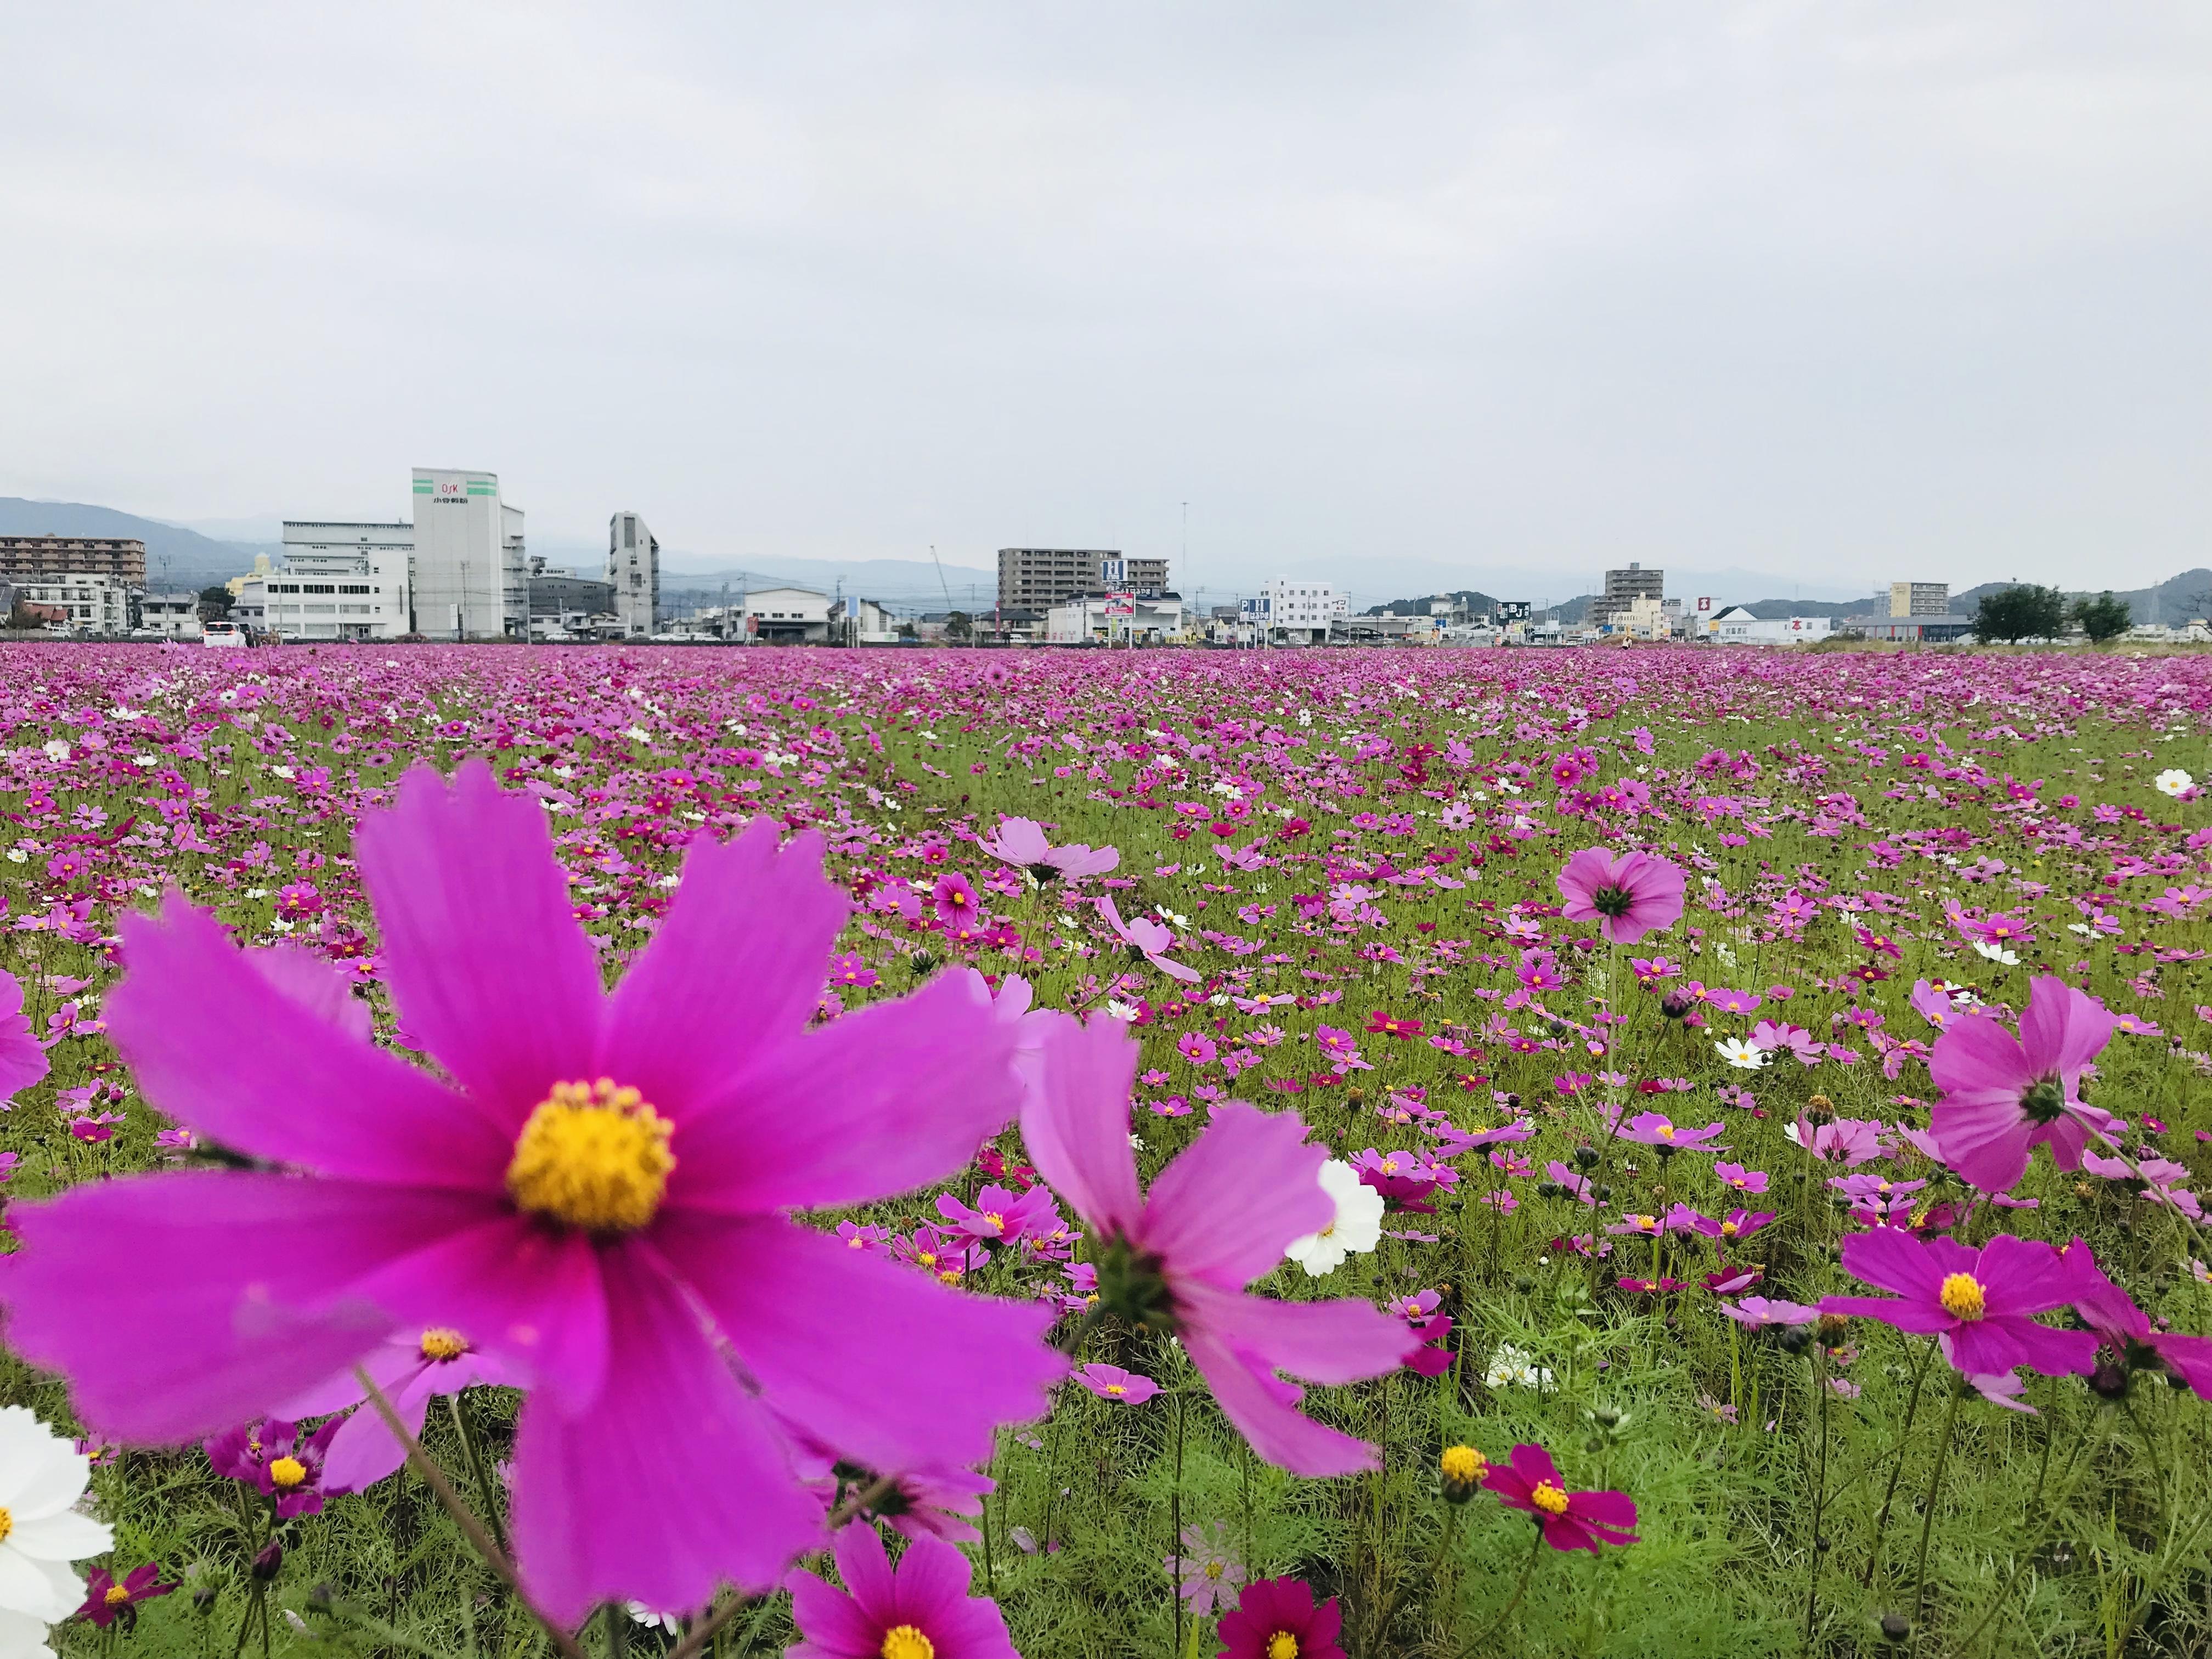 http://shikoku.misawa.co.jp/area_kouchi/image2.jpeg